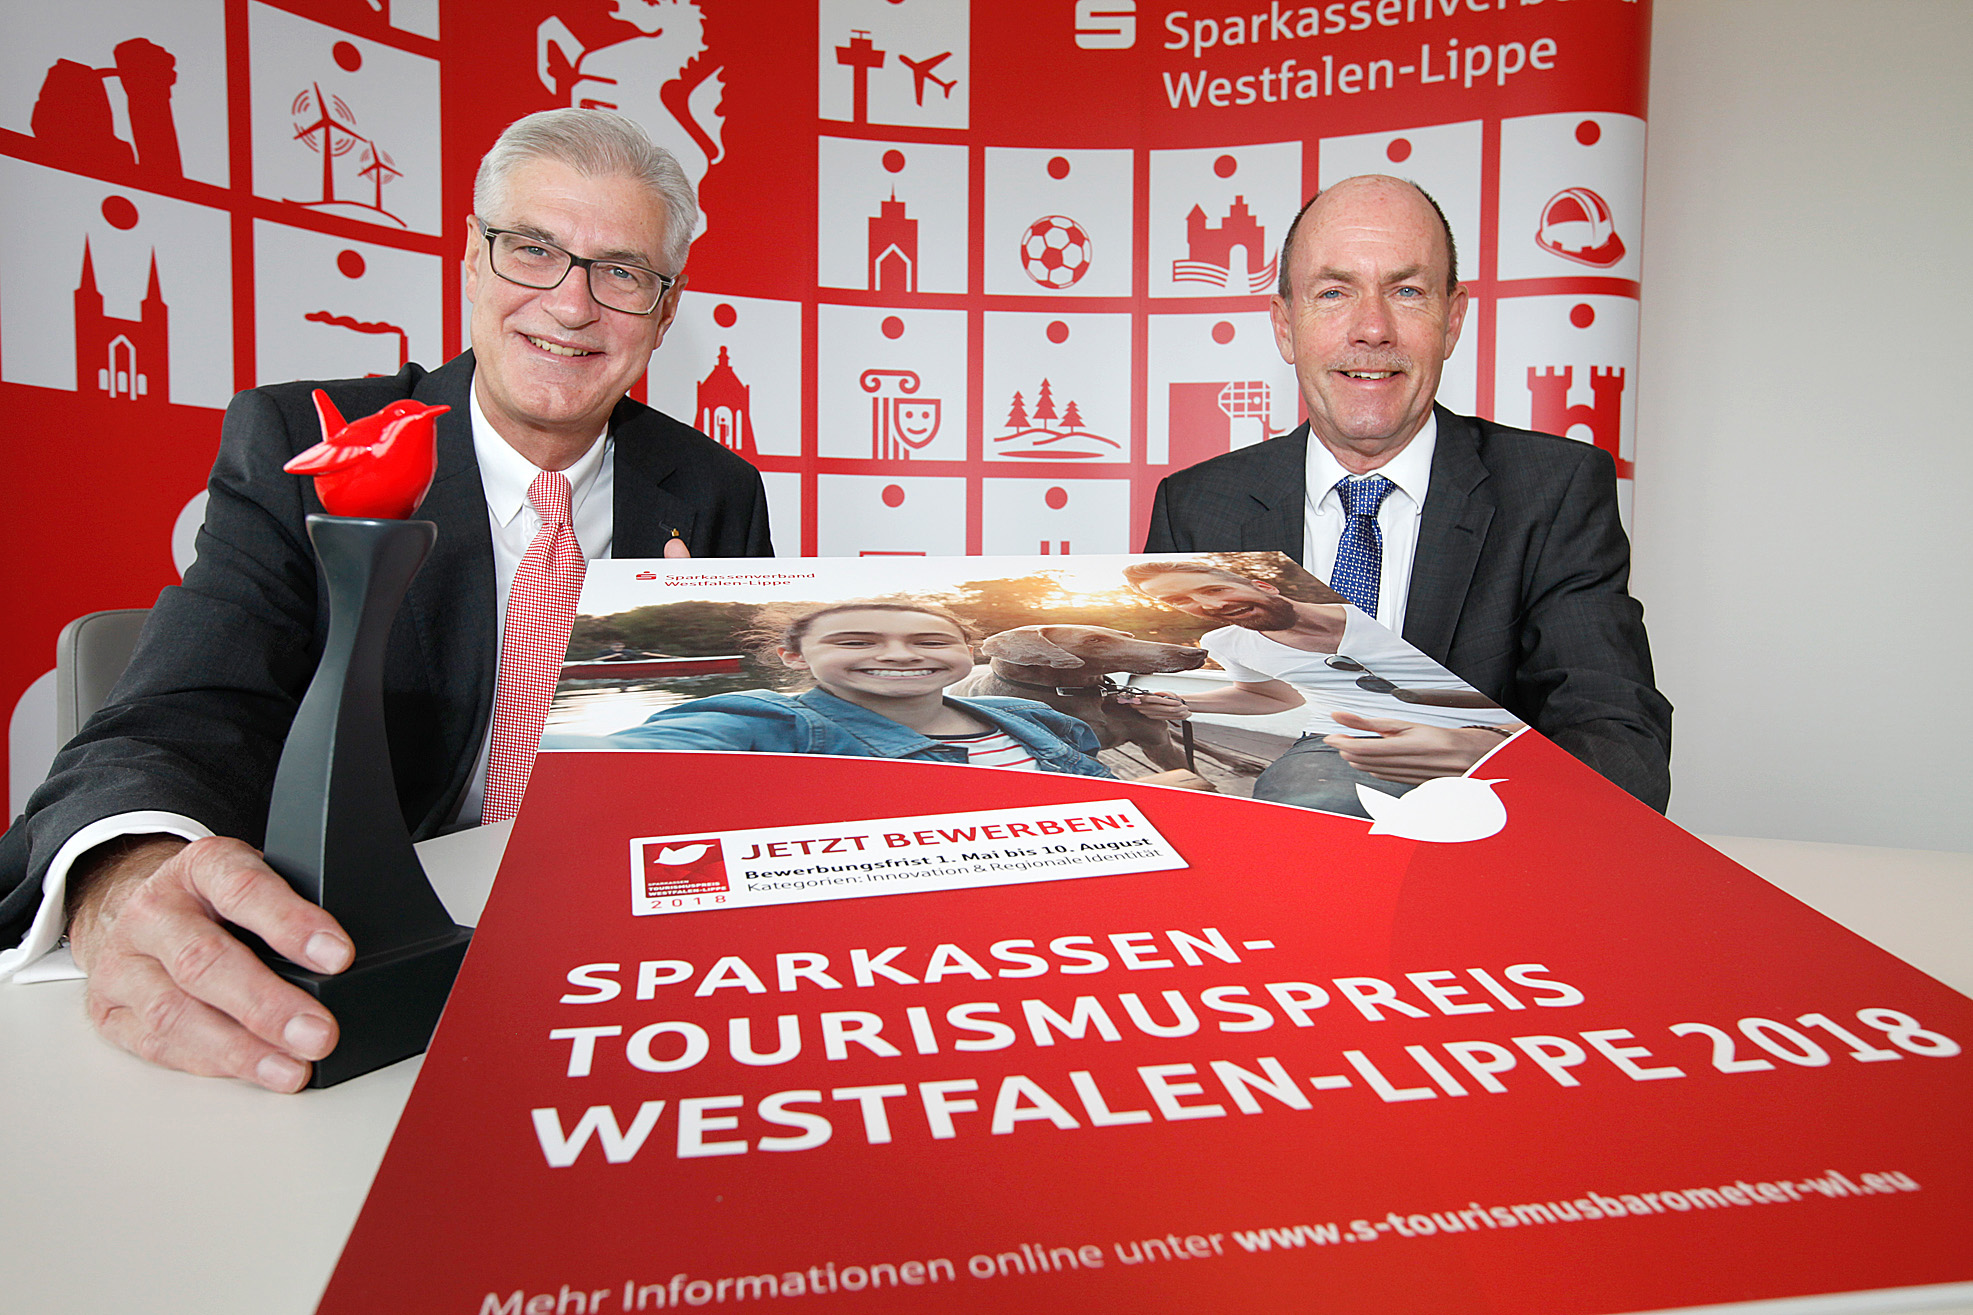 2018_04_24 Auftakt Tourismuspreis Westfalen-Lippe